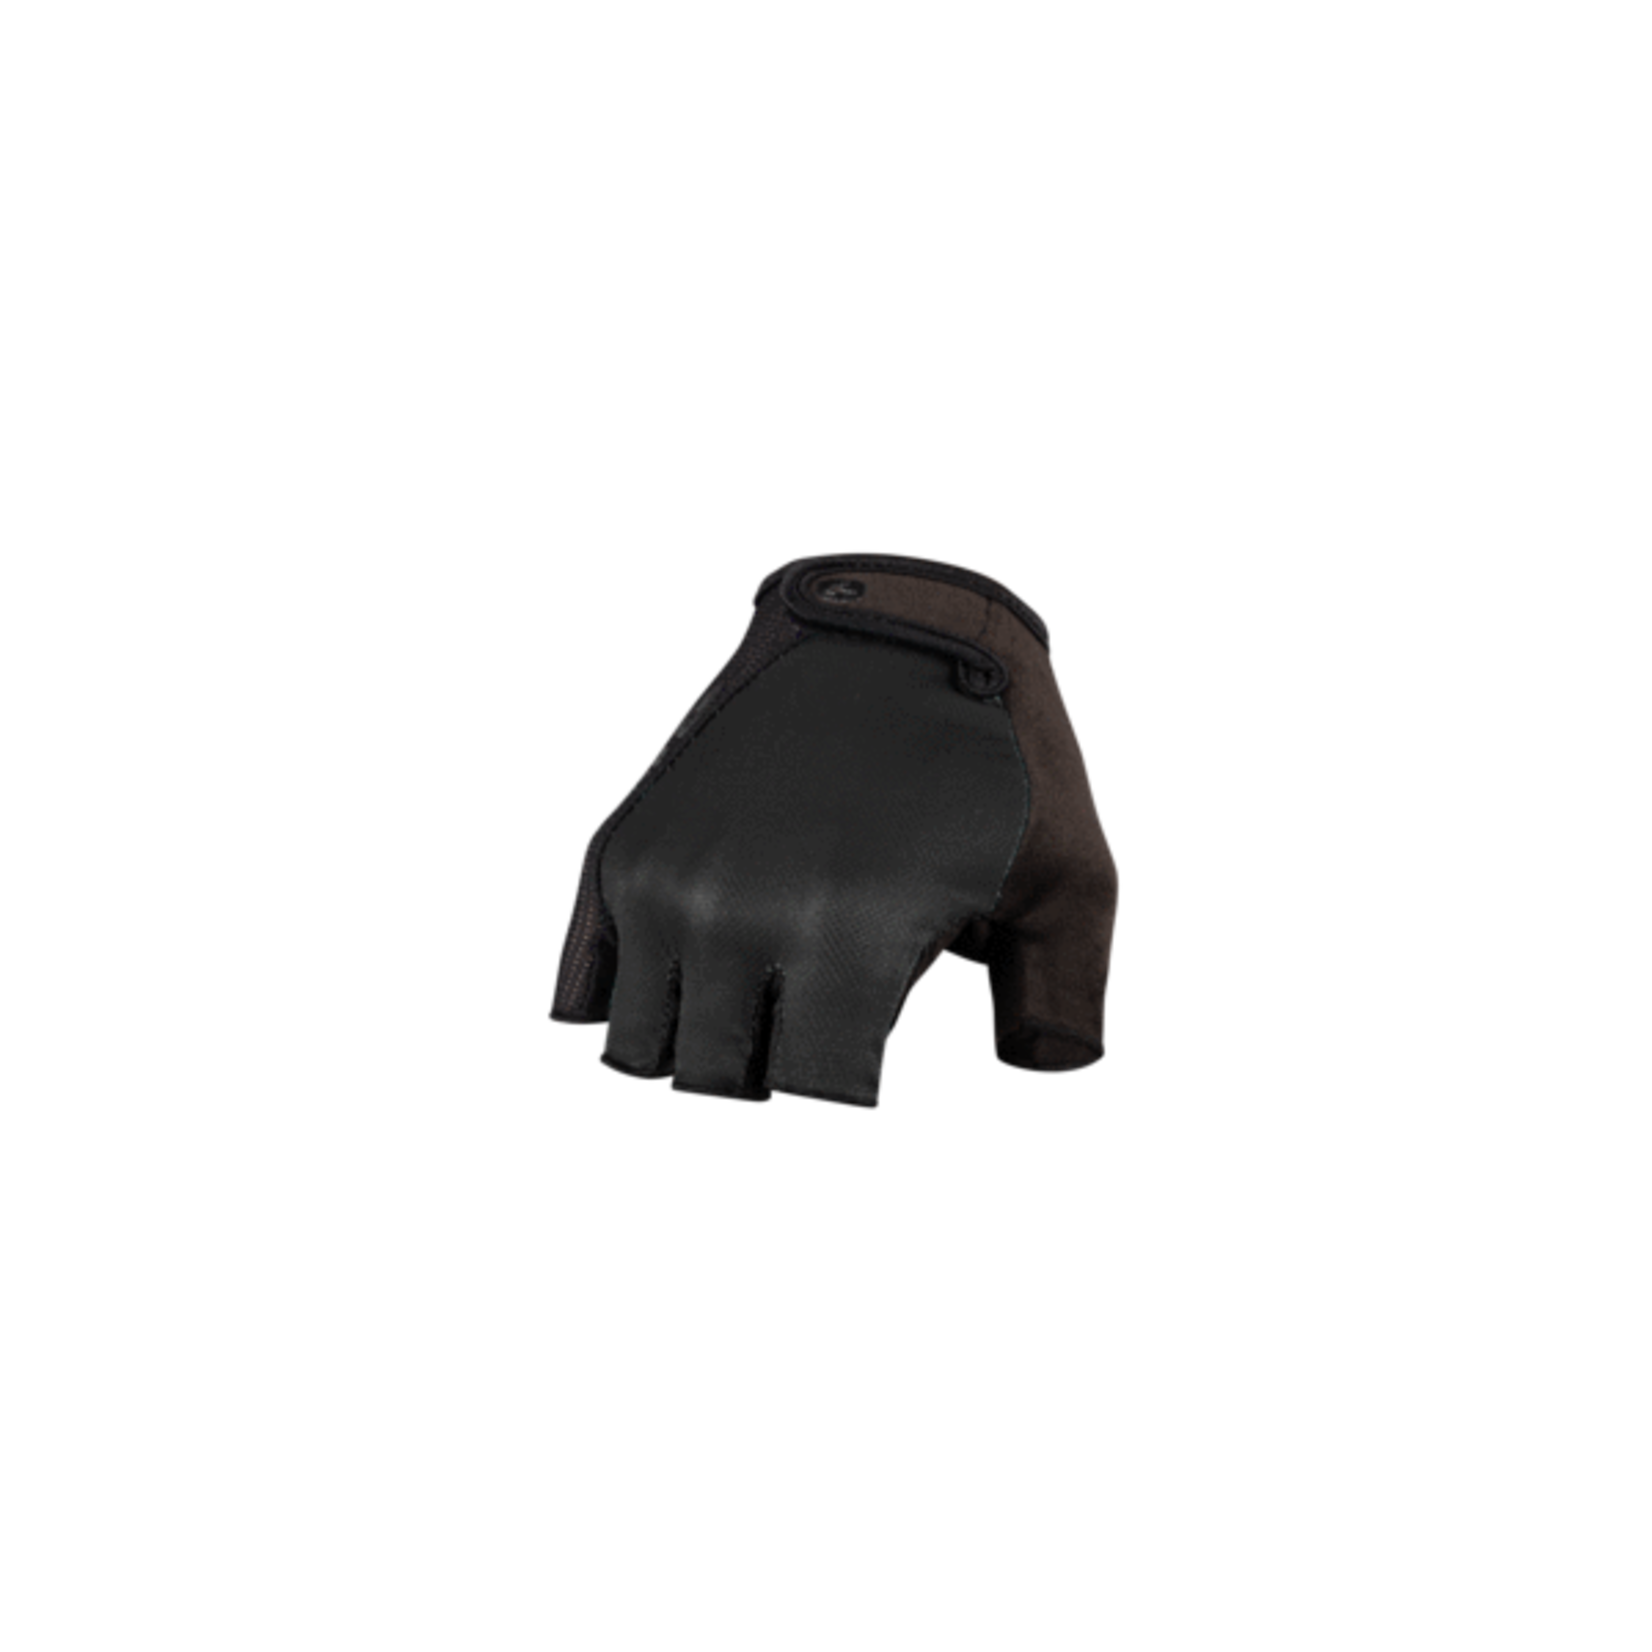 Sugoi Sugoi Performance Fingerless Glove Men's